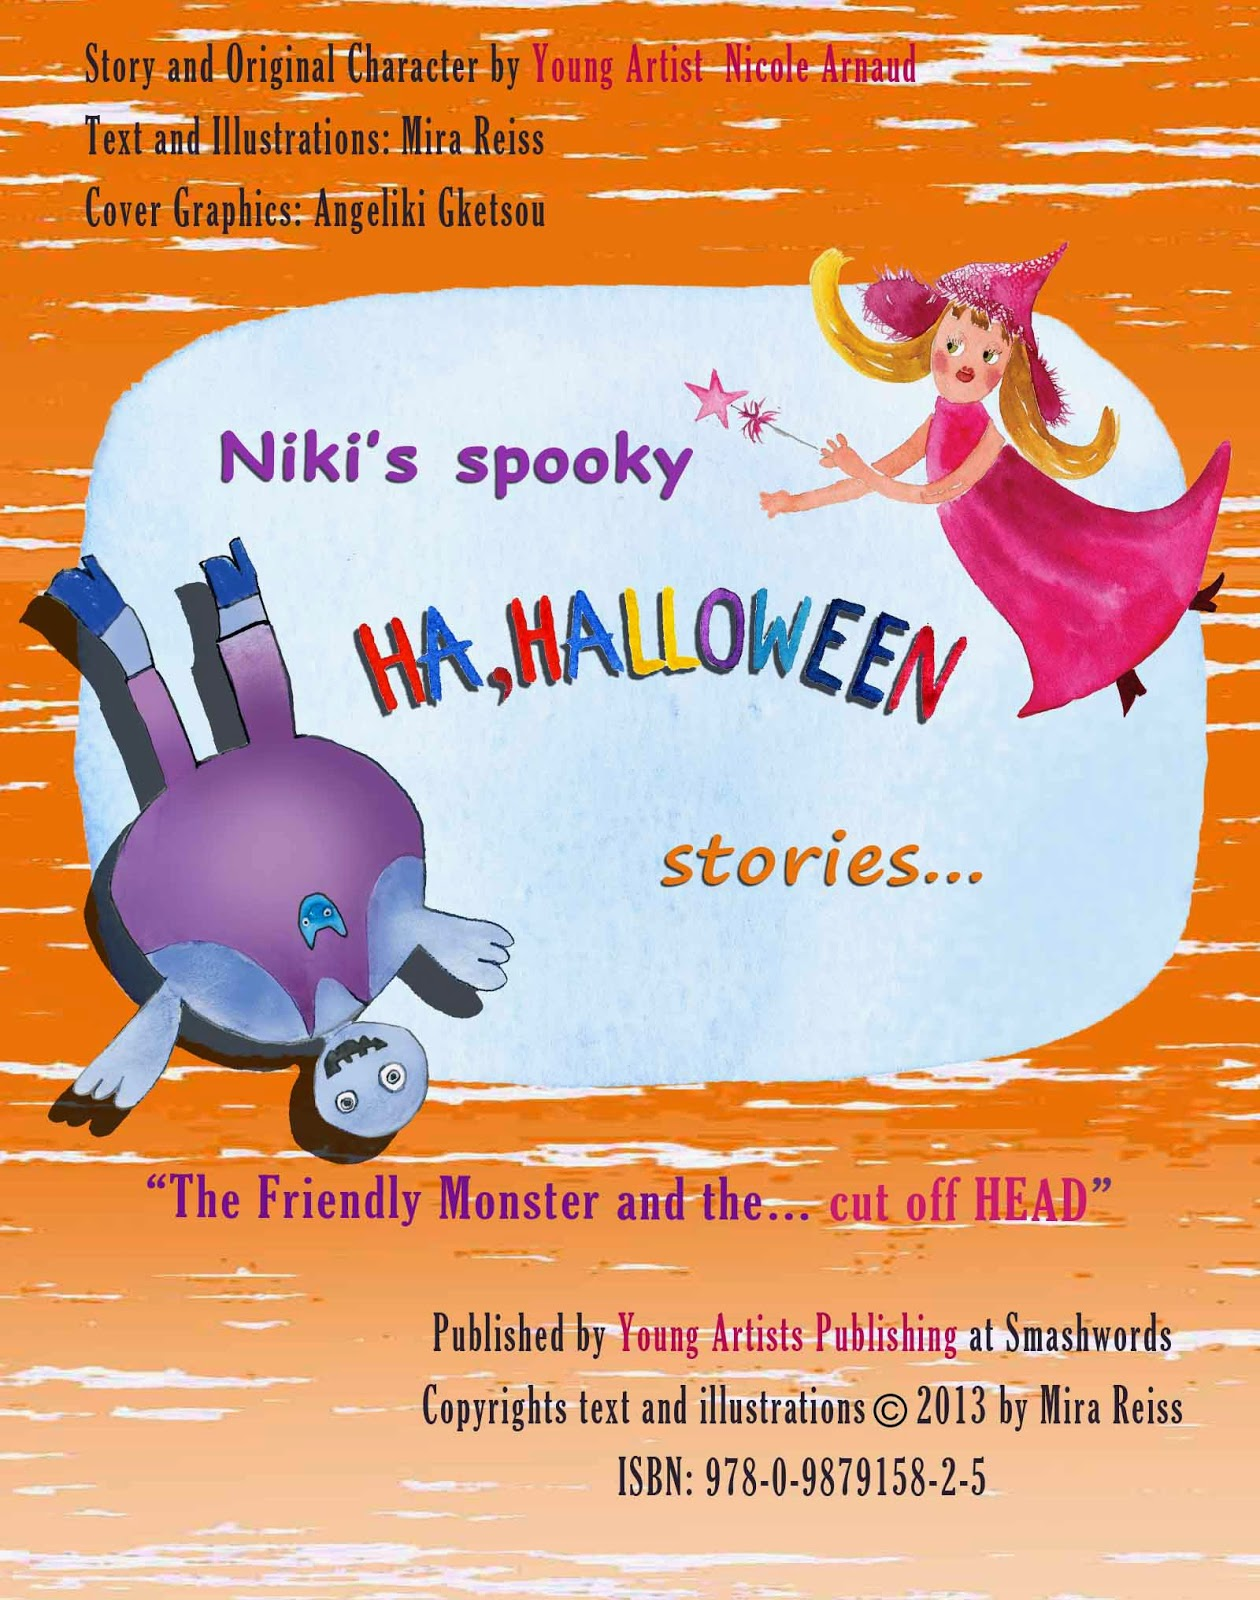 http://www.barnesandnoble.com/s/Niki-Spooky-Ha-Halloween-stories?store=nookstore&keyword=Niki%27Spooky+Ha%2C+Halloween+stories